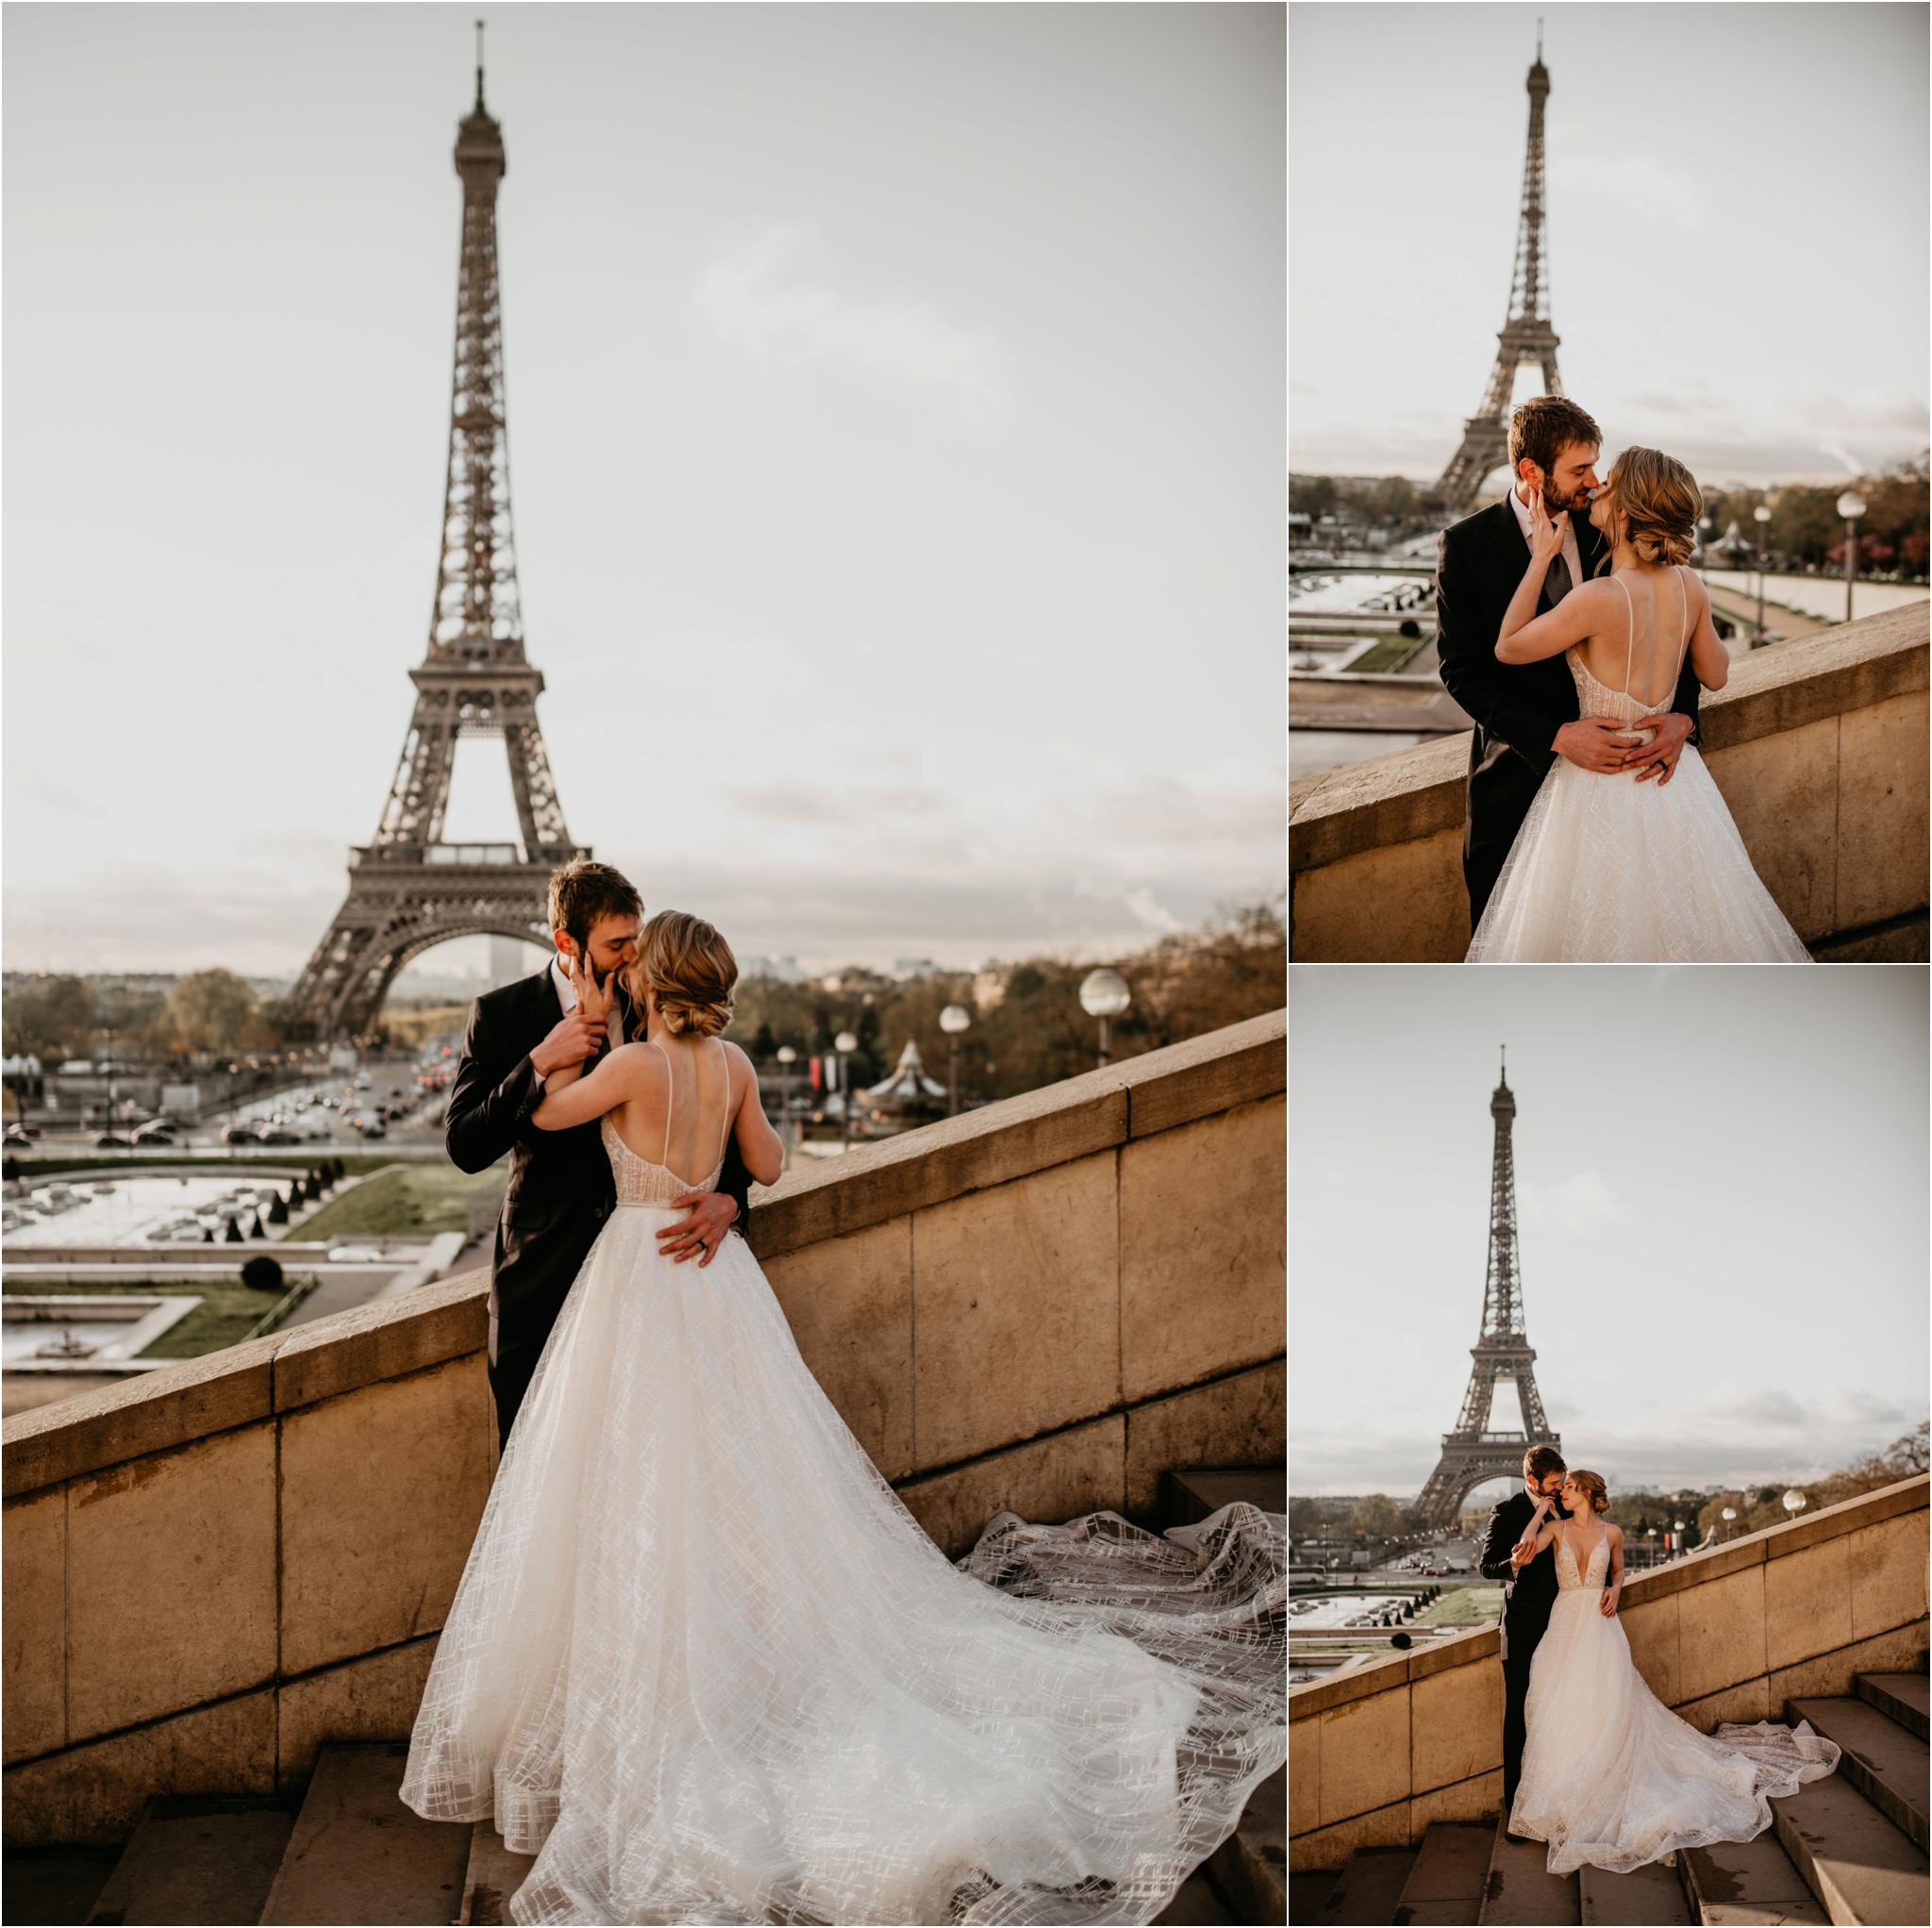 miranda-and-jared-paris-elopement-destination-wedding-photographer-052.jpg